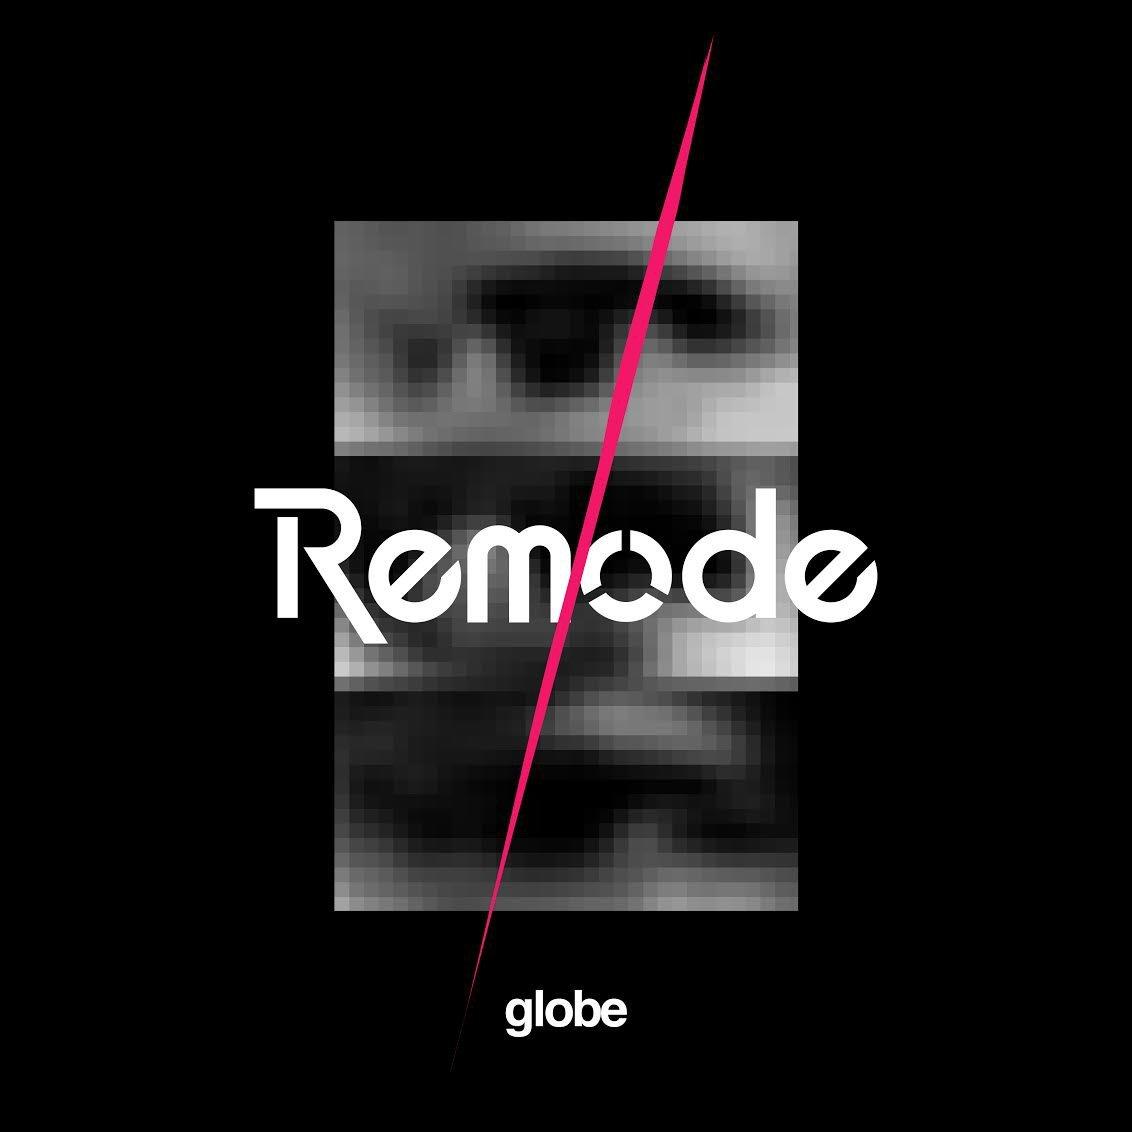 Remode1